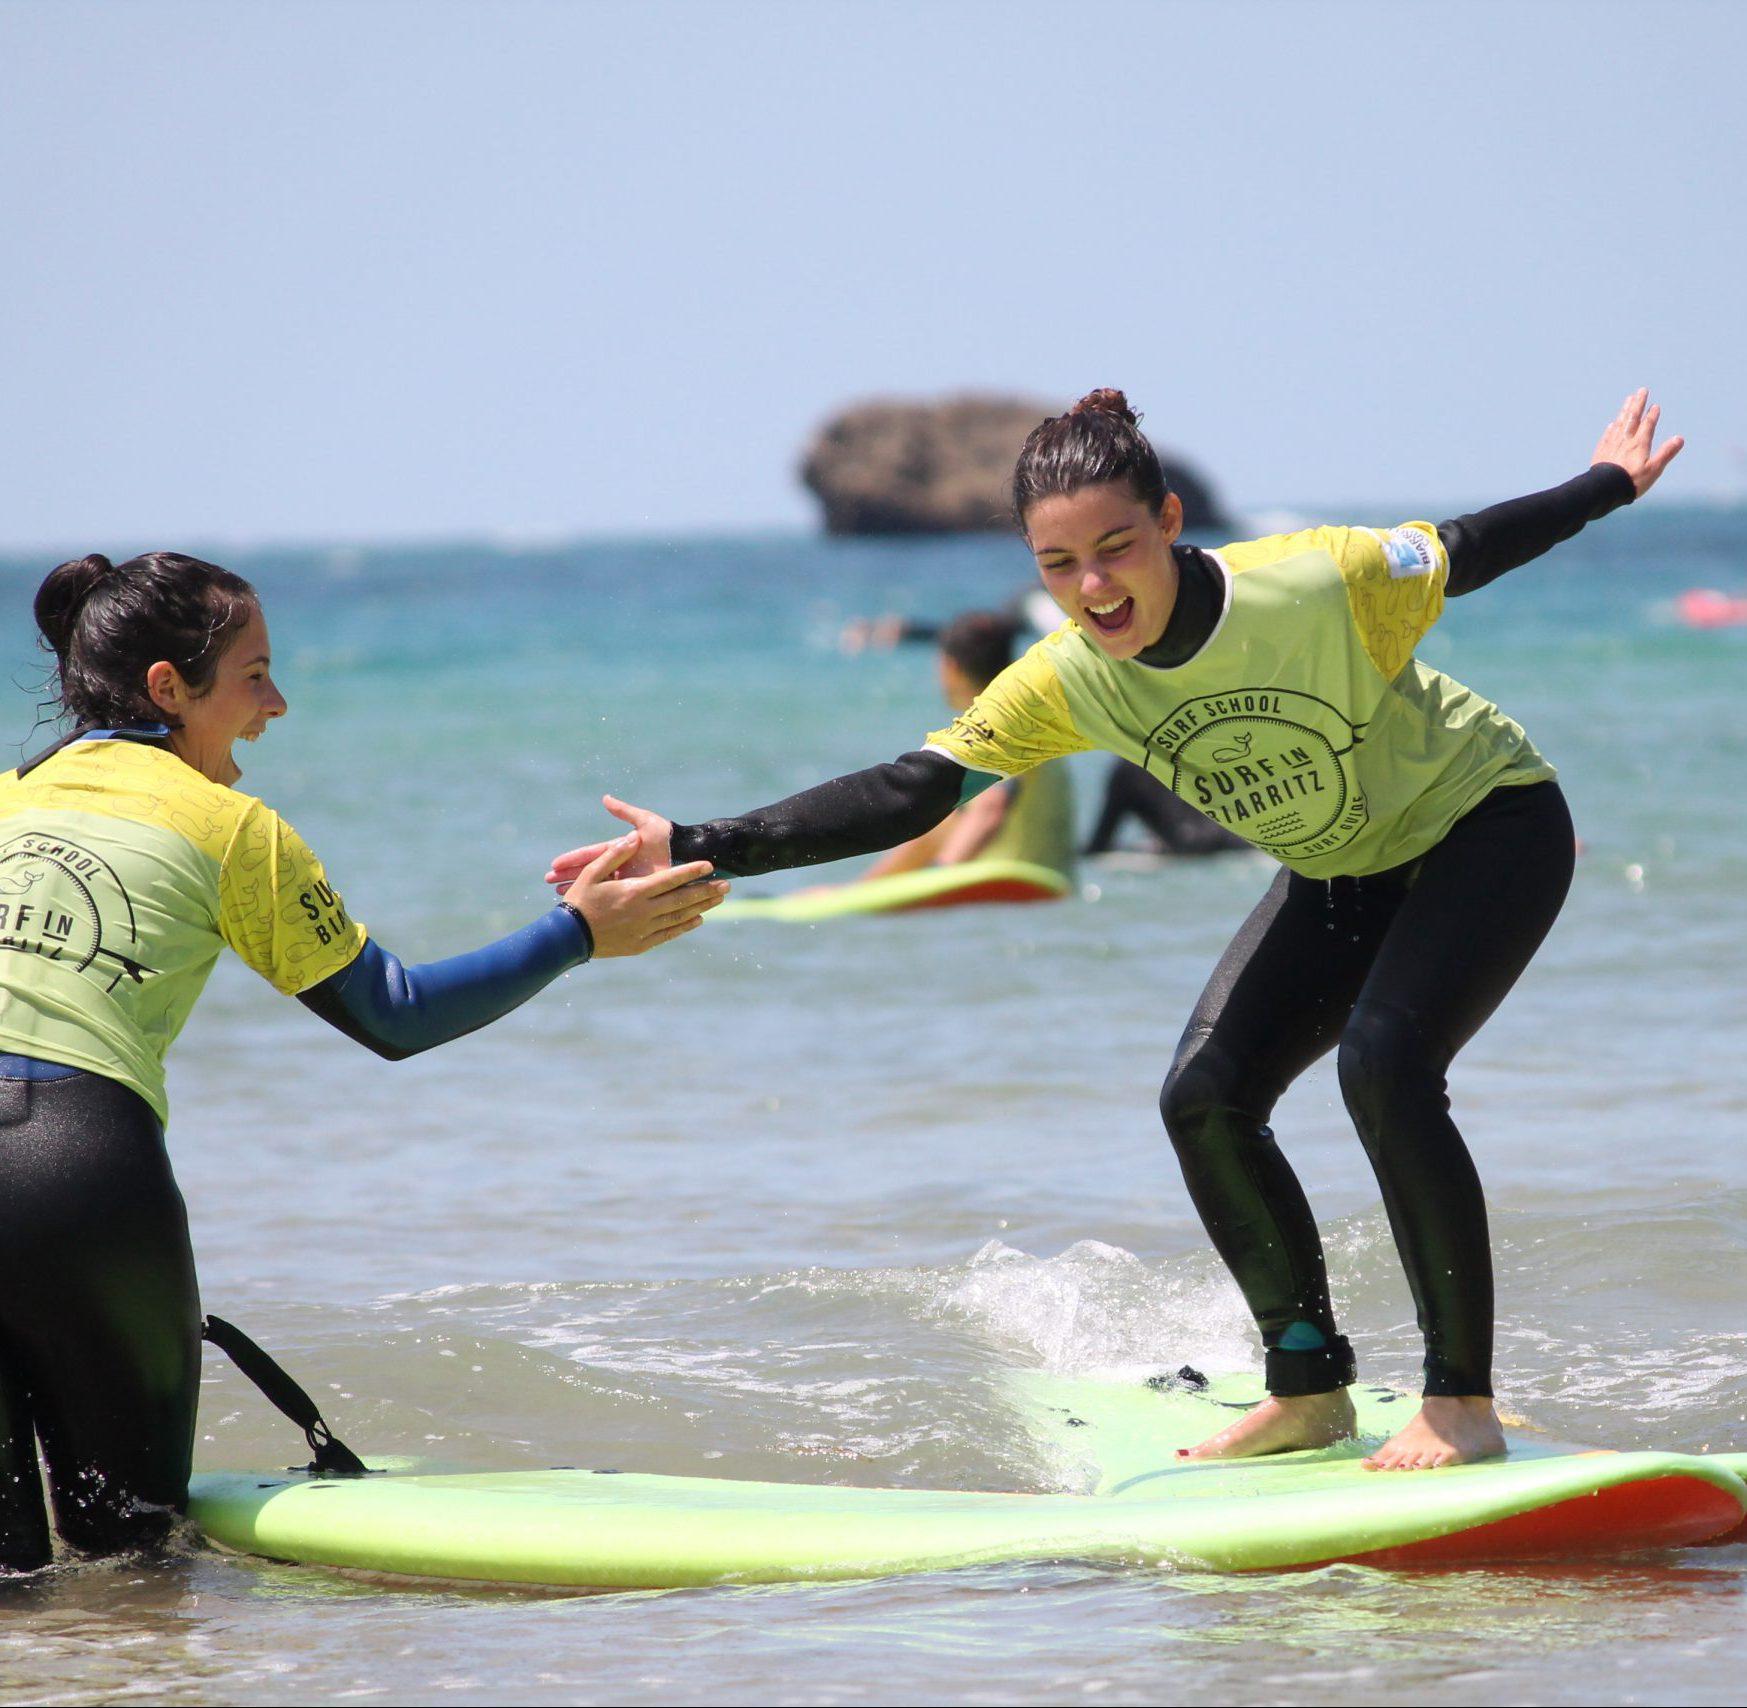 Cours de surf collectif Biarritz